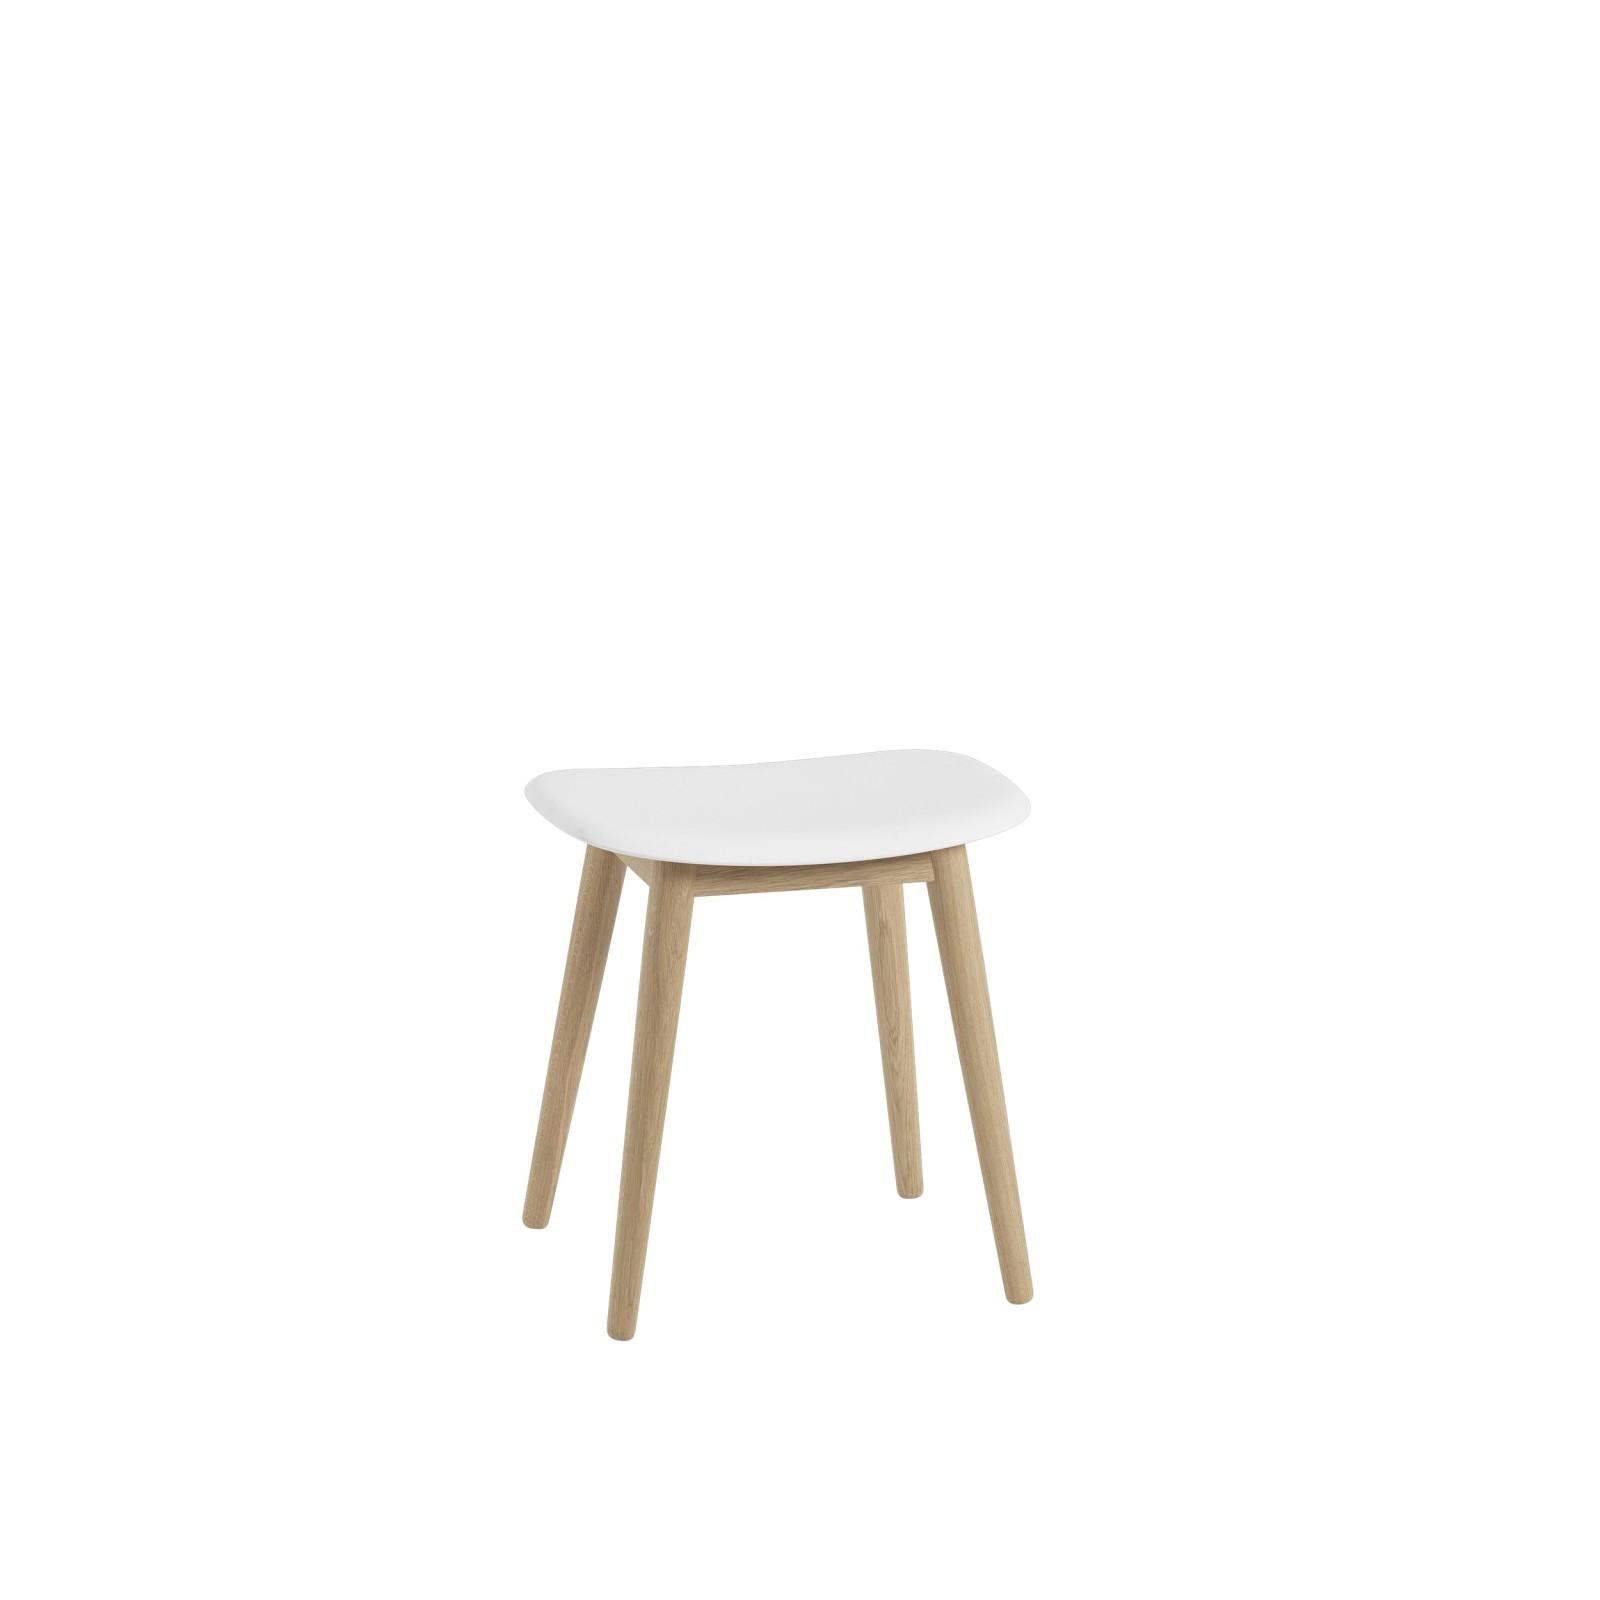 Fiber Stool Wood Base - Unupholstered Natural White/Oak